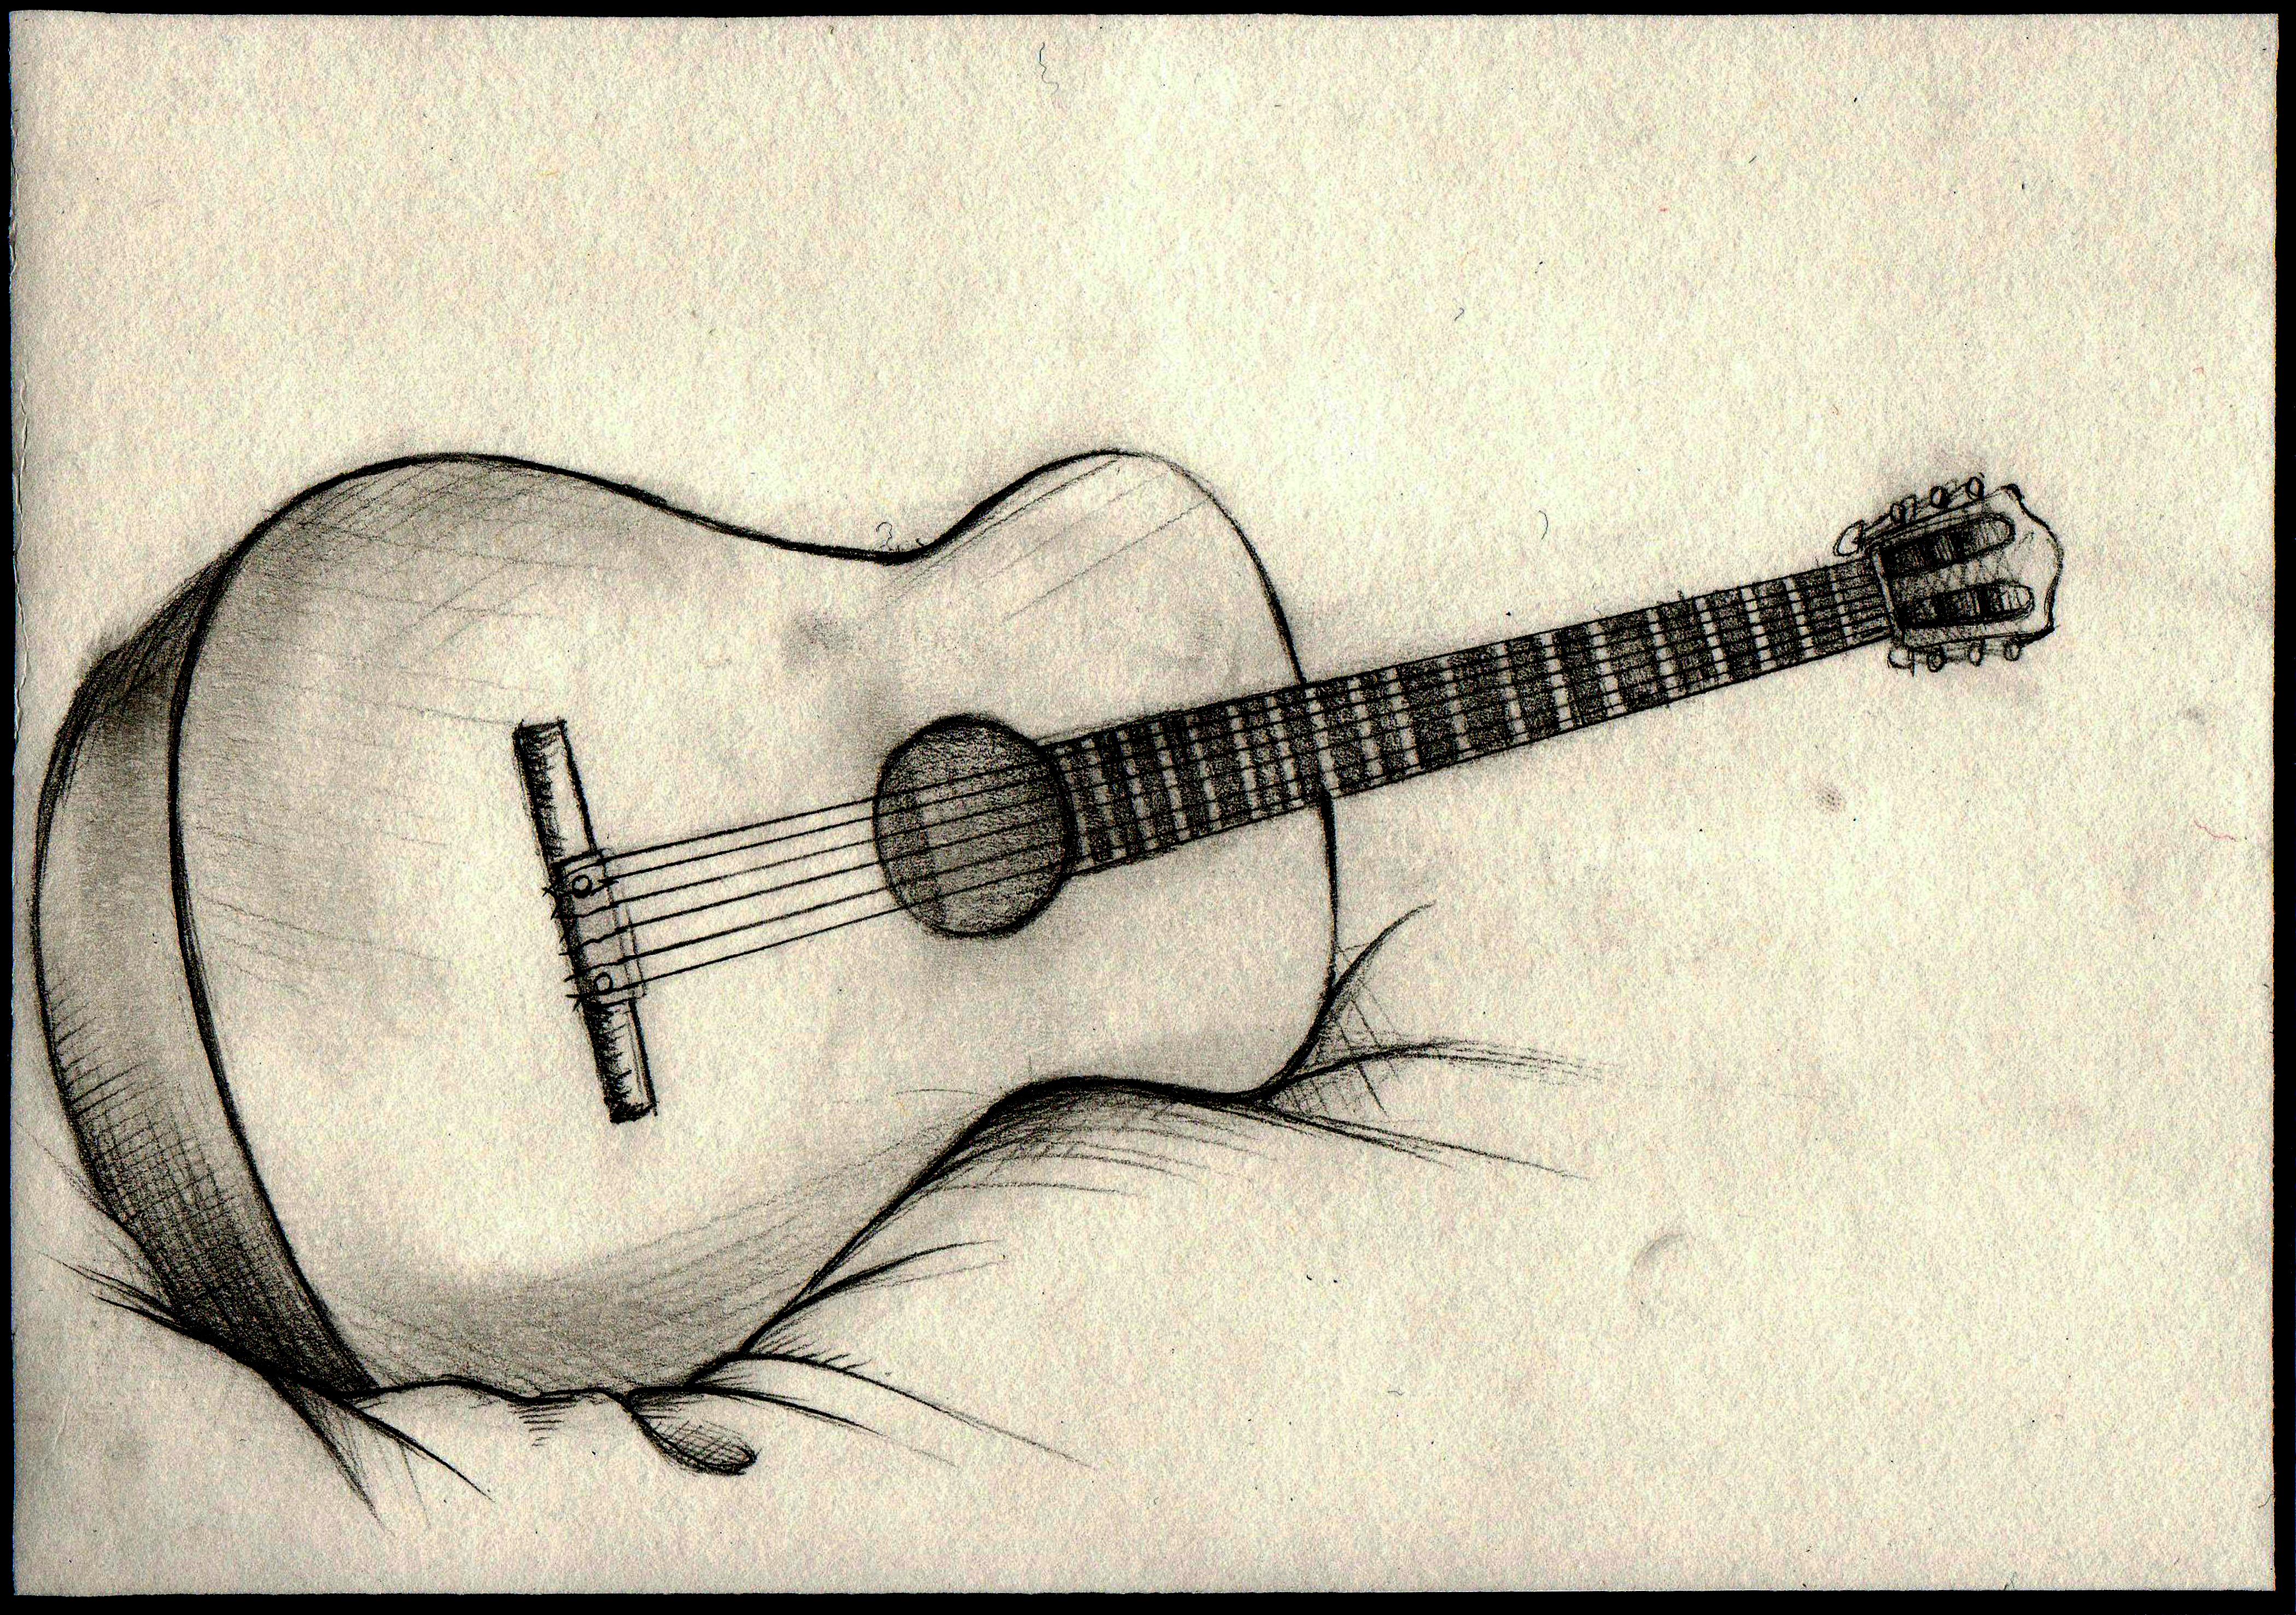 4199x2953 Easy Pencil Drawings Of Guitar